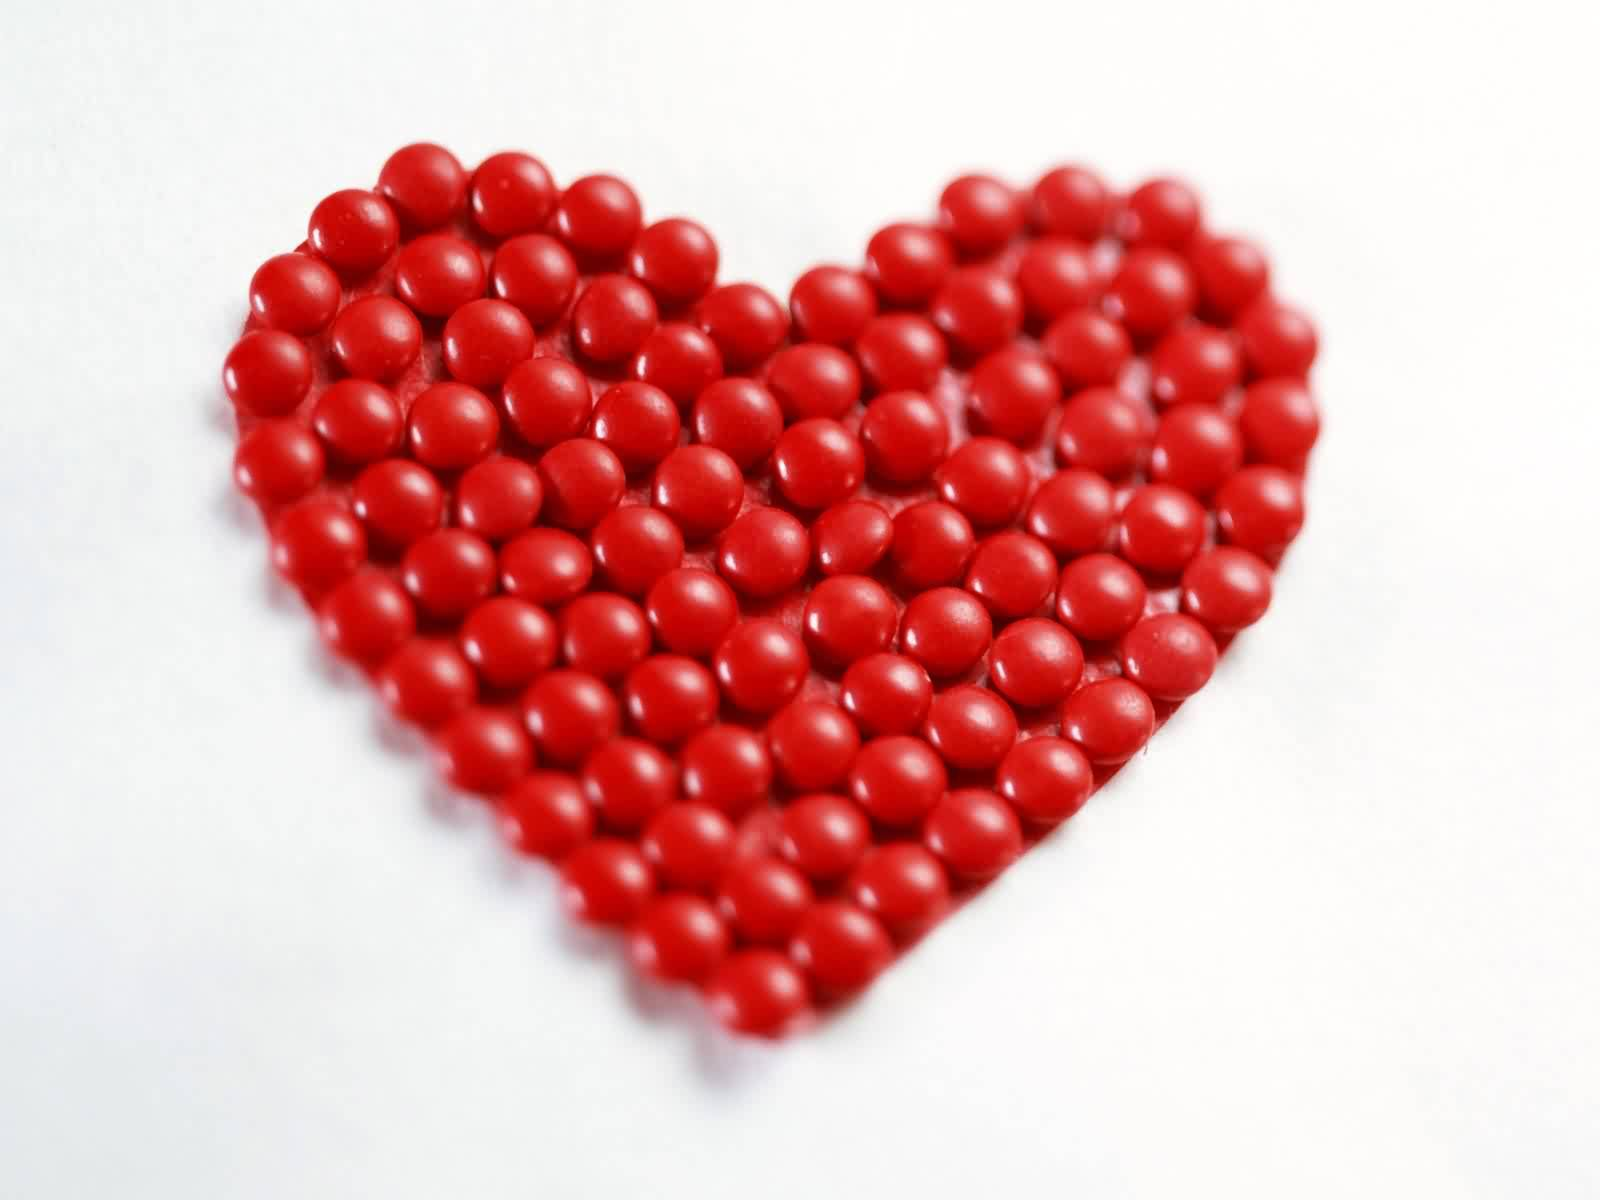 http://4.bp.blogspot.com/-UO_p2WheqBM/TkaOfp1ujQI/AAAAAAAAA-s/AXIfQKwpdCA/s1600/Love_Wallpapers_Umeaurhum117.JPG